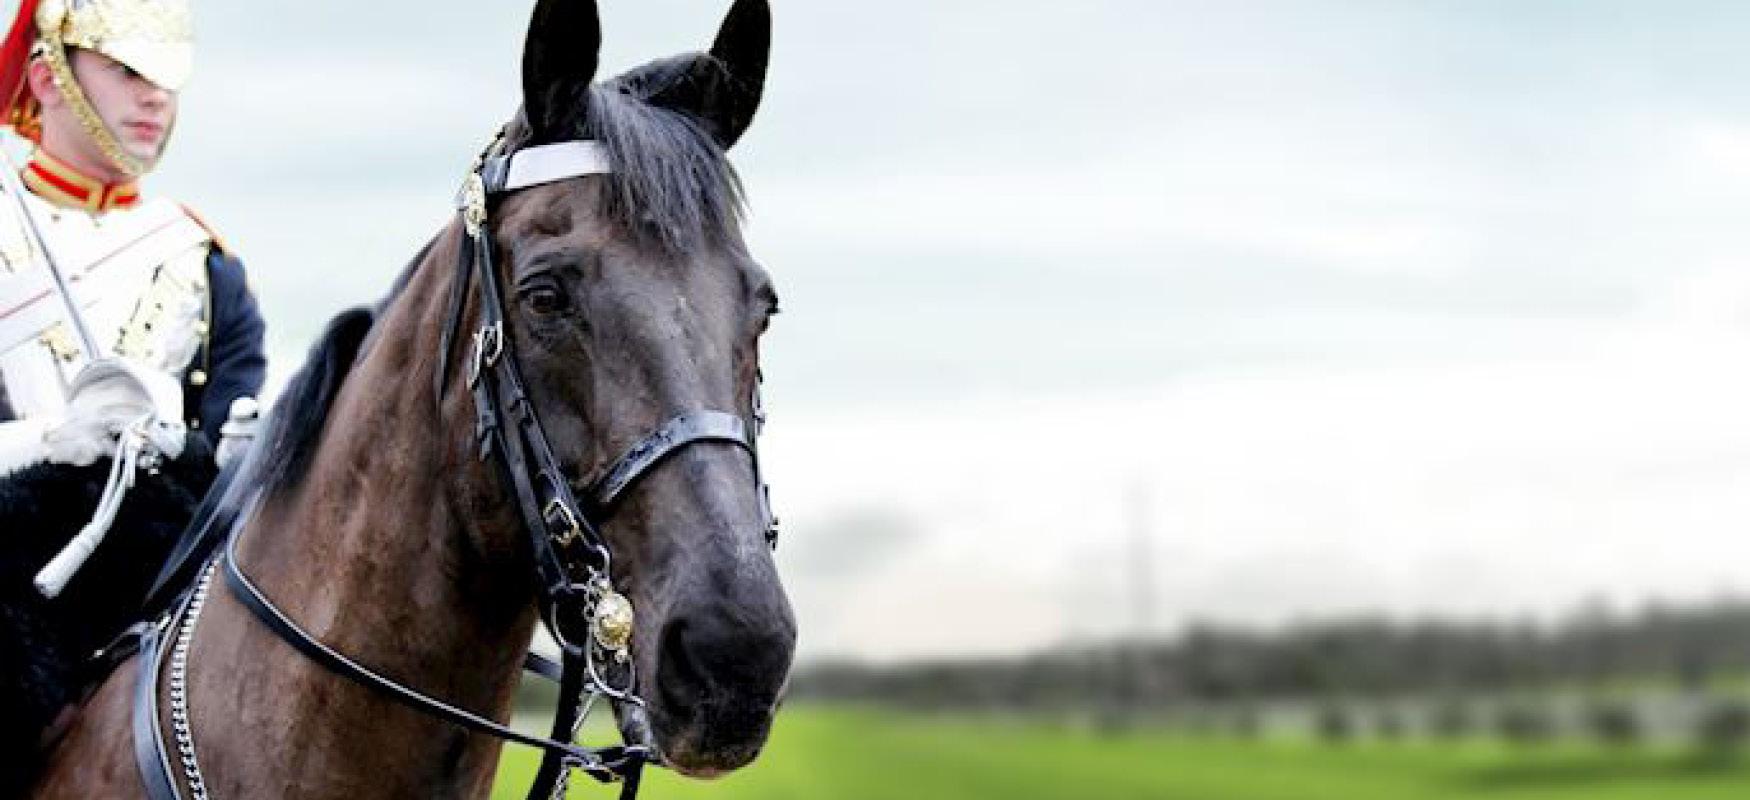 sandown horseracing, surrey, esher, jockey club